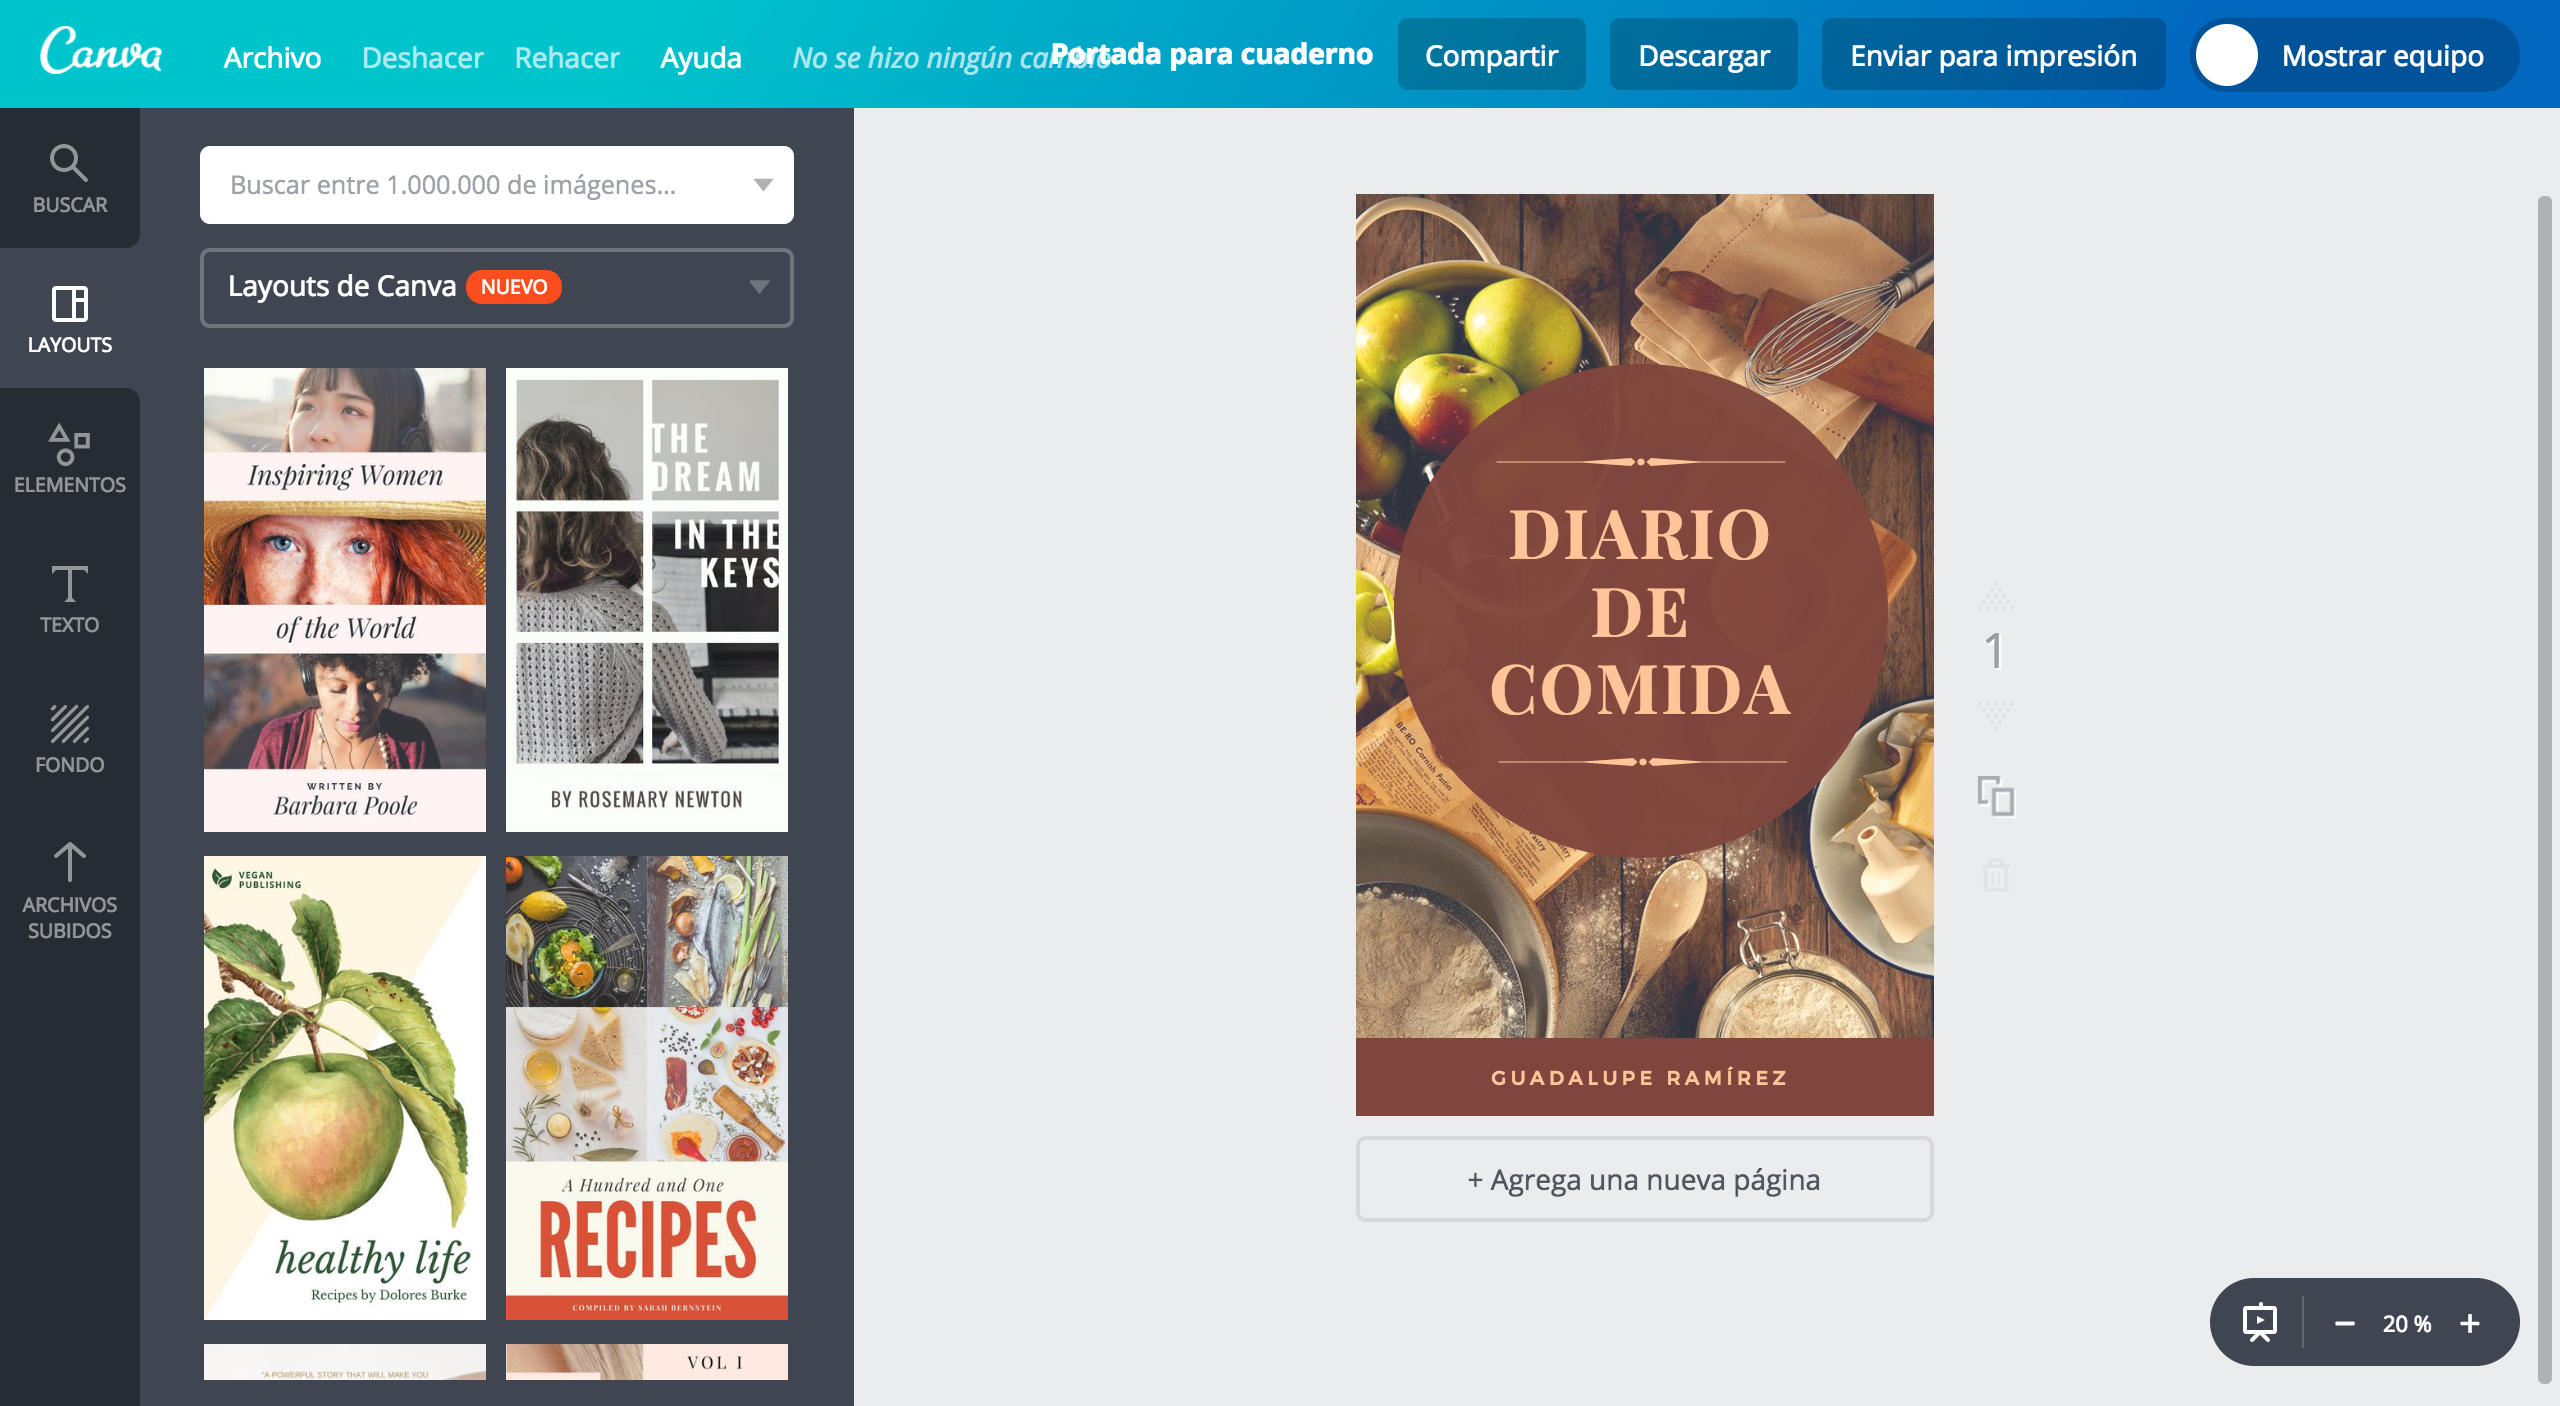 Dibujos Para Portadas De Cuaderno: Diseña Portadas Para Cuadernos Gratis En Minutos